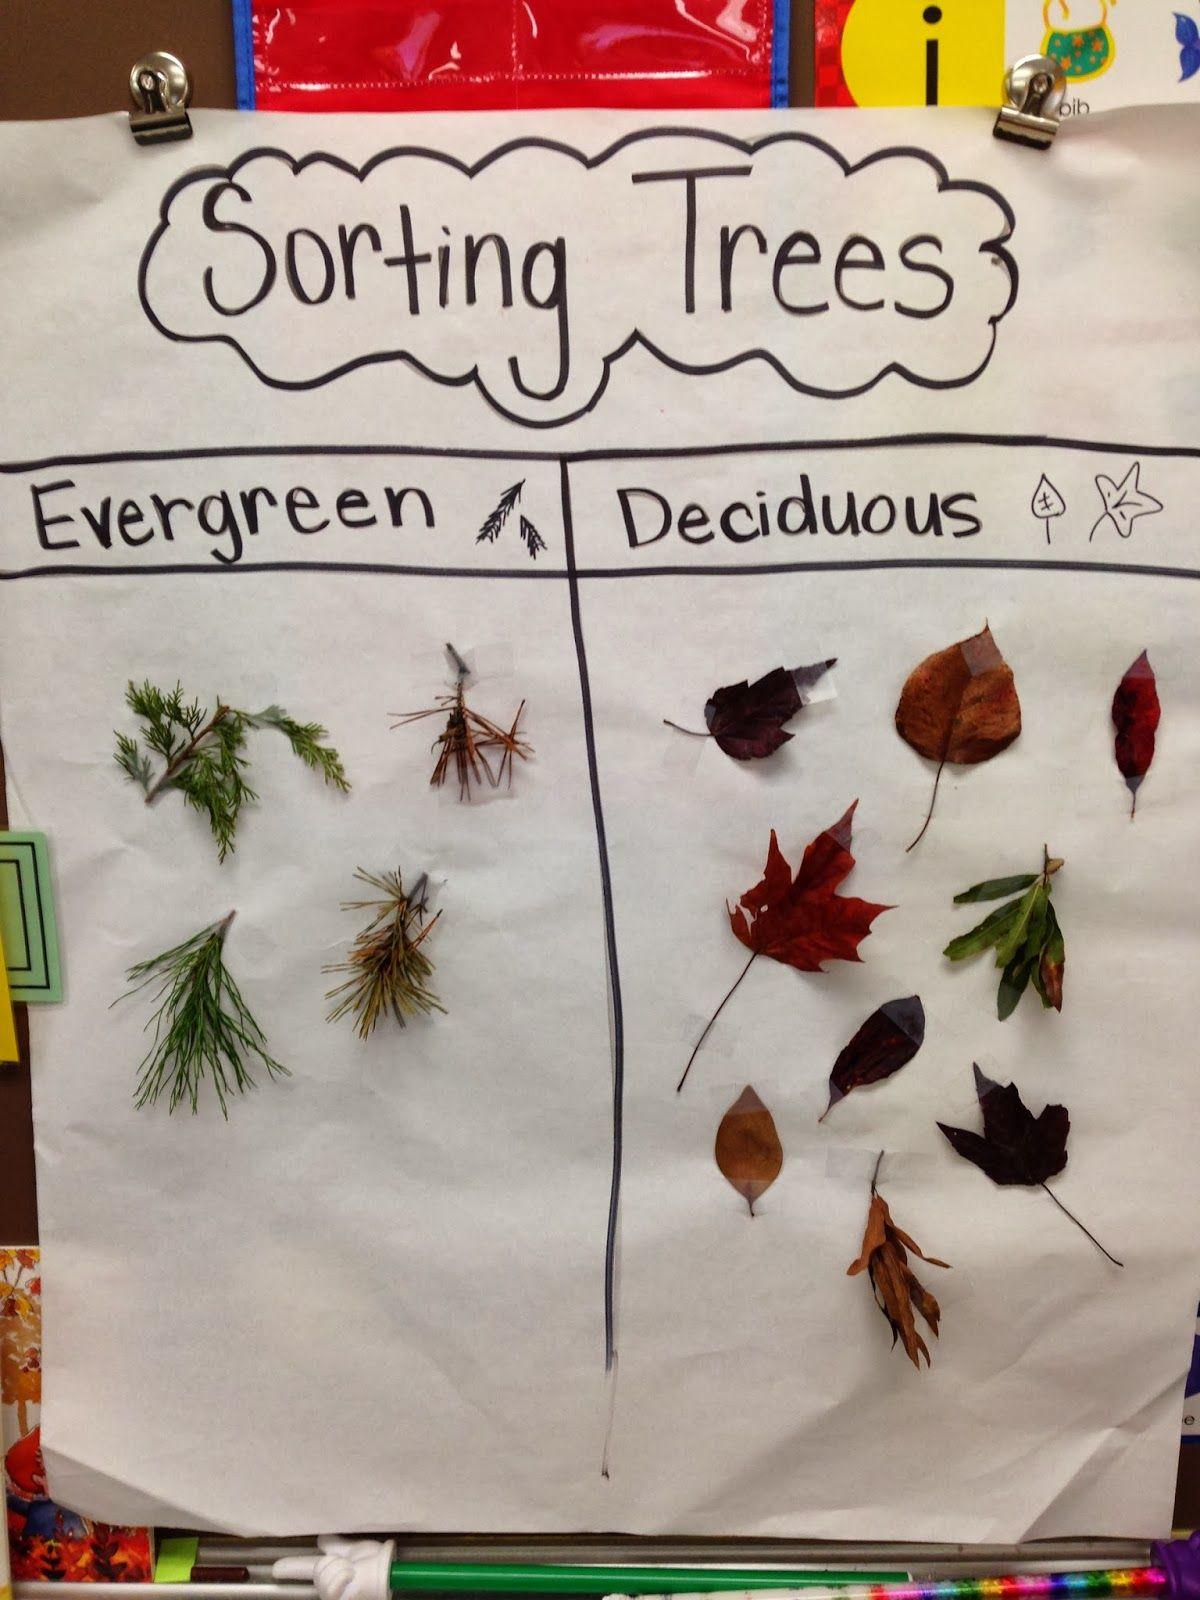 Sorting Trees Chart Mon. Nov. 10th Megan pls collect